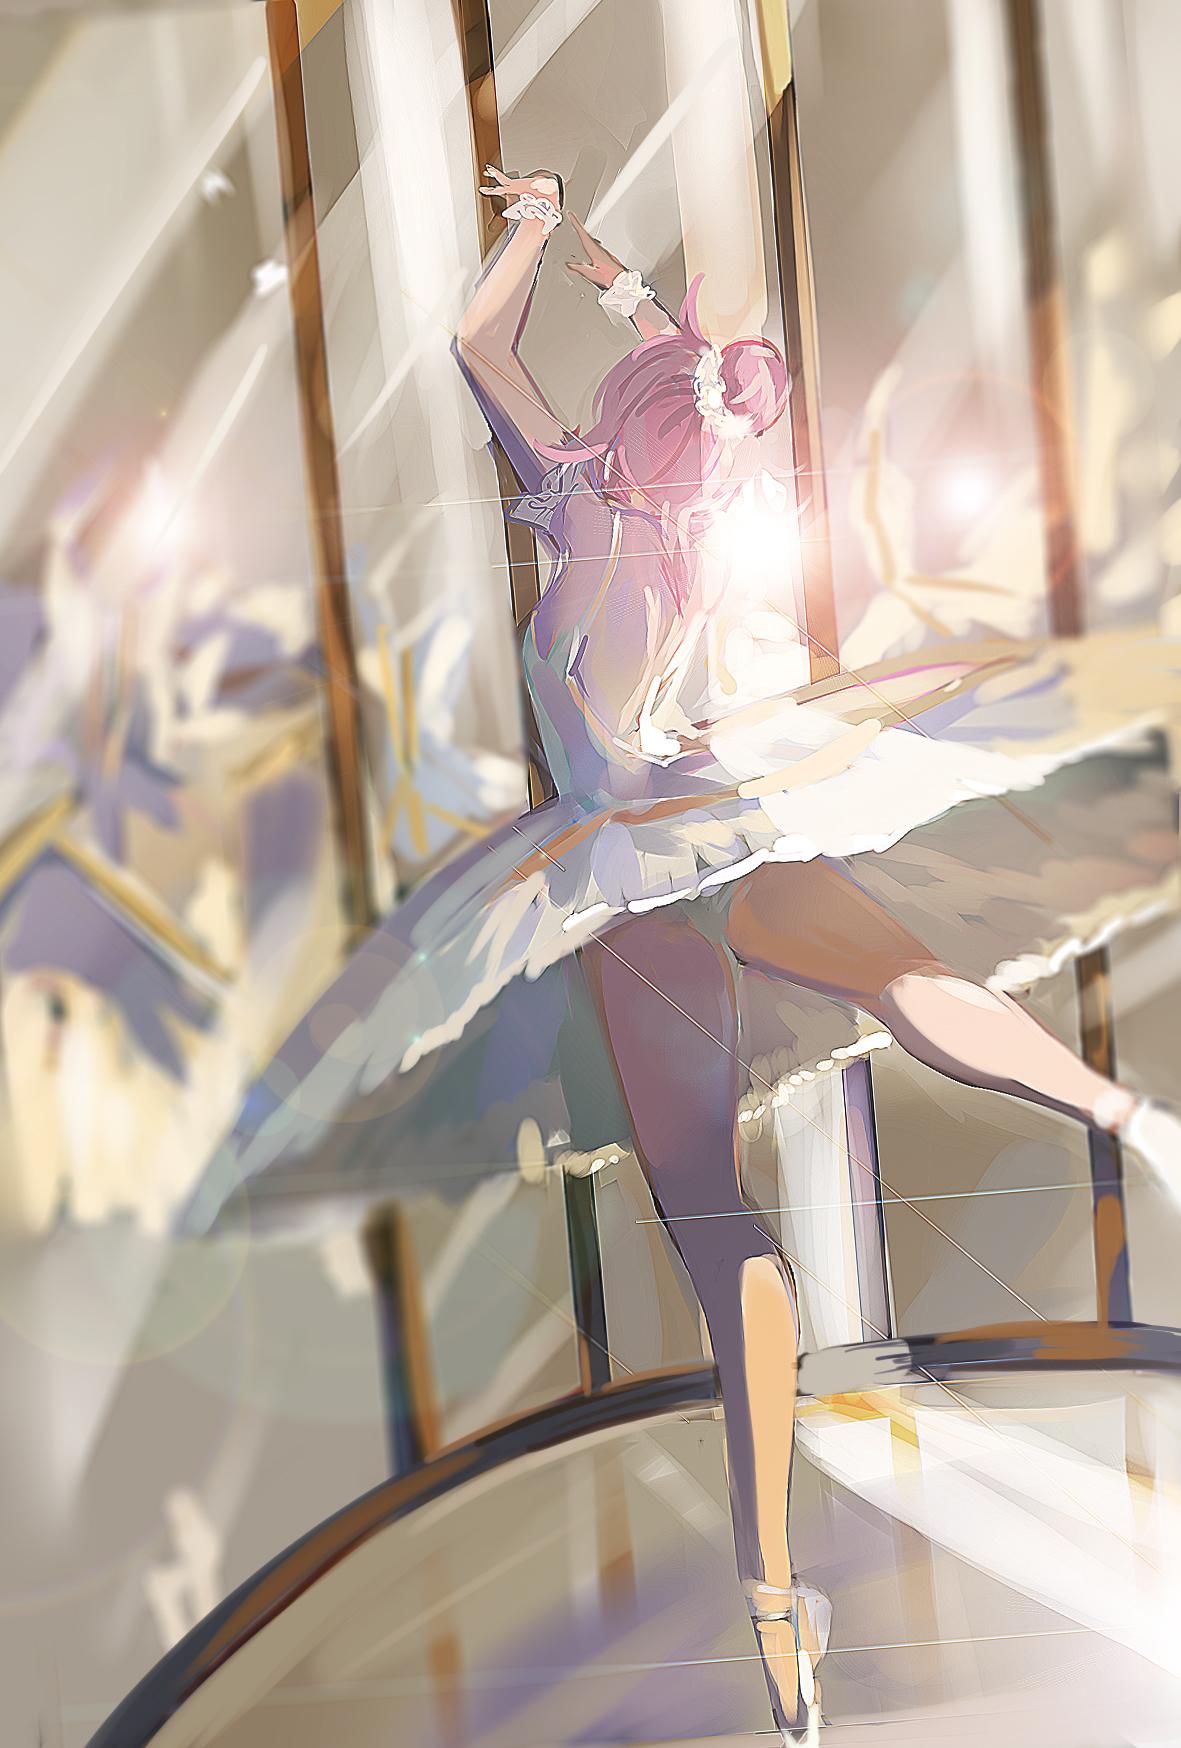 Картинка аниме девушка танцует